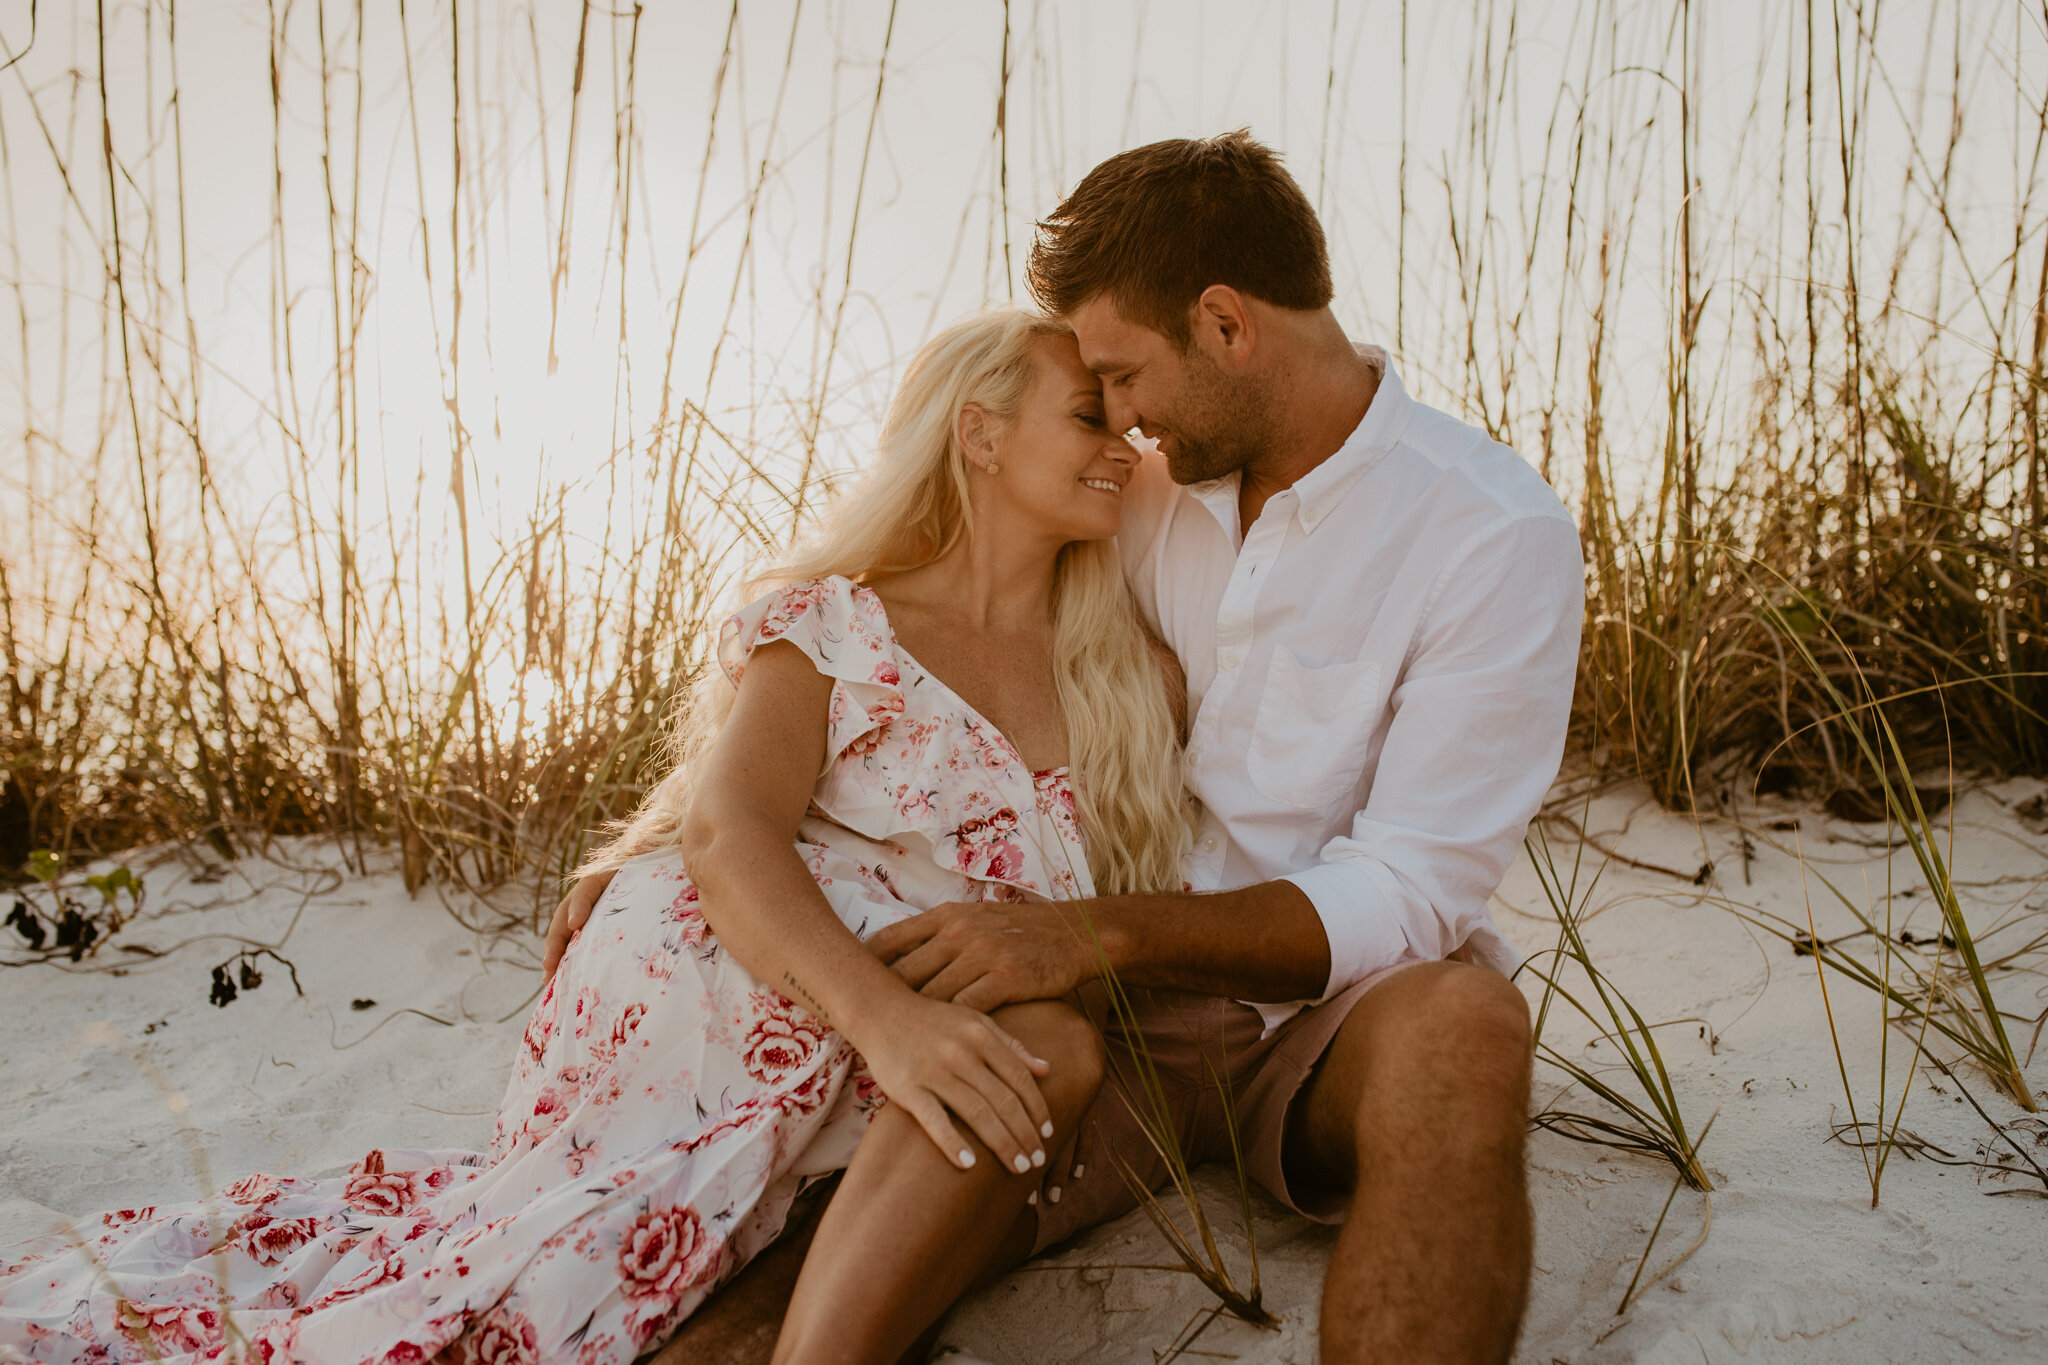 Tampa-lakeside-couples-session-heyitsthelopezesphotography-2